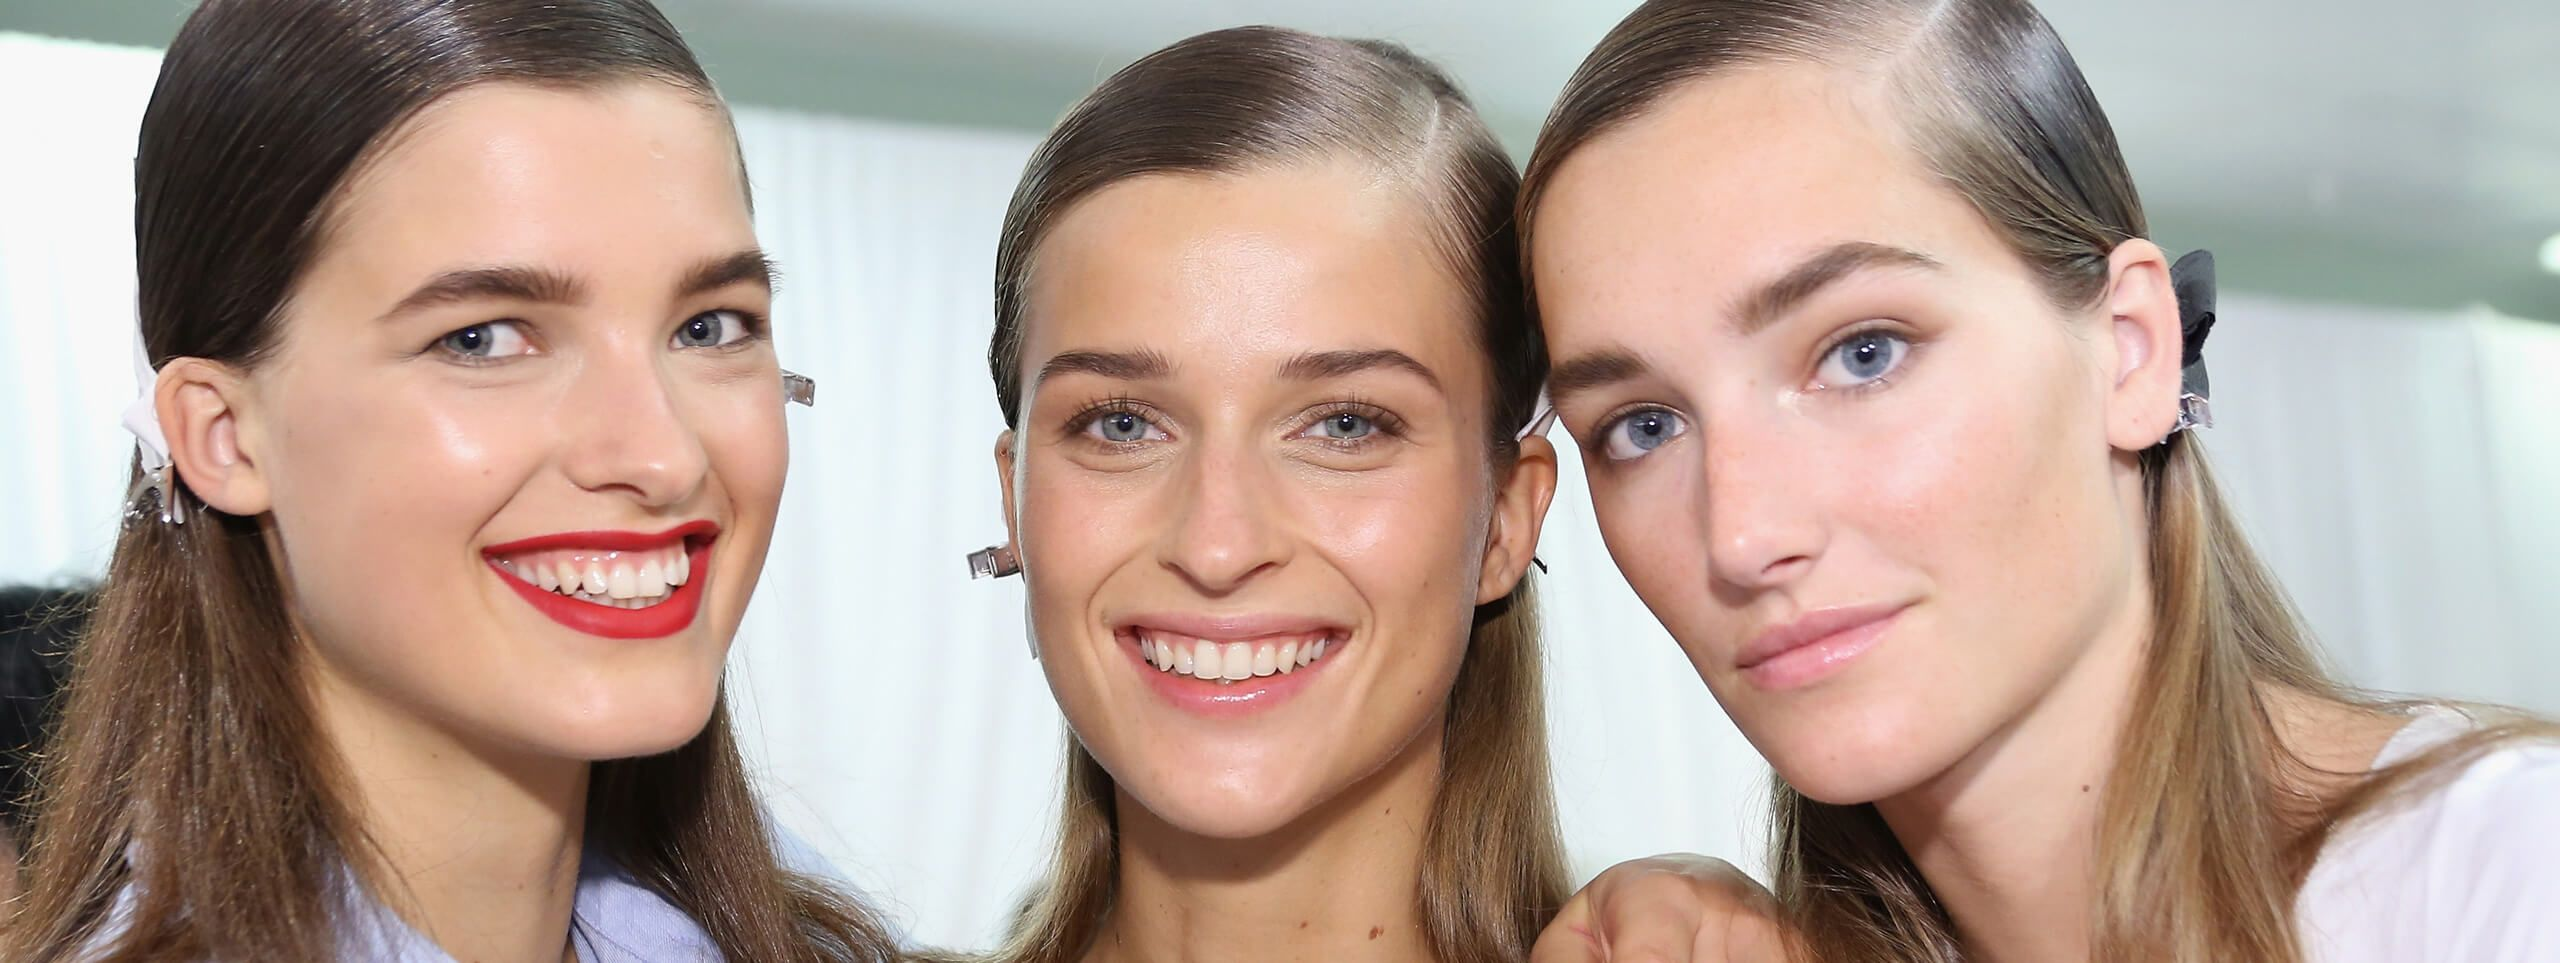 Female models rock wet-look hairstyles created with gel